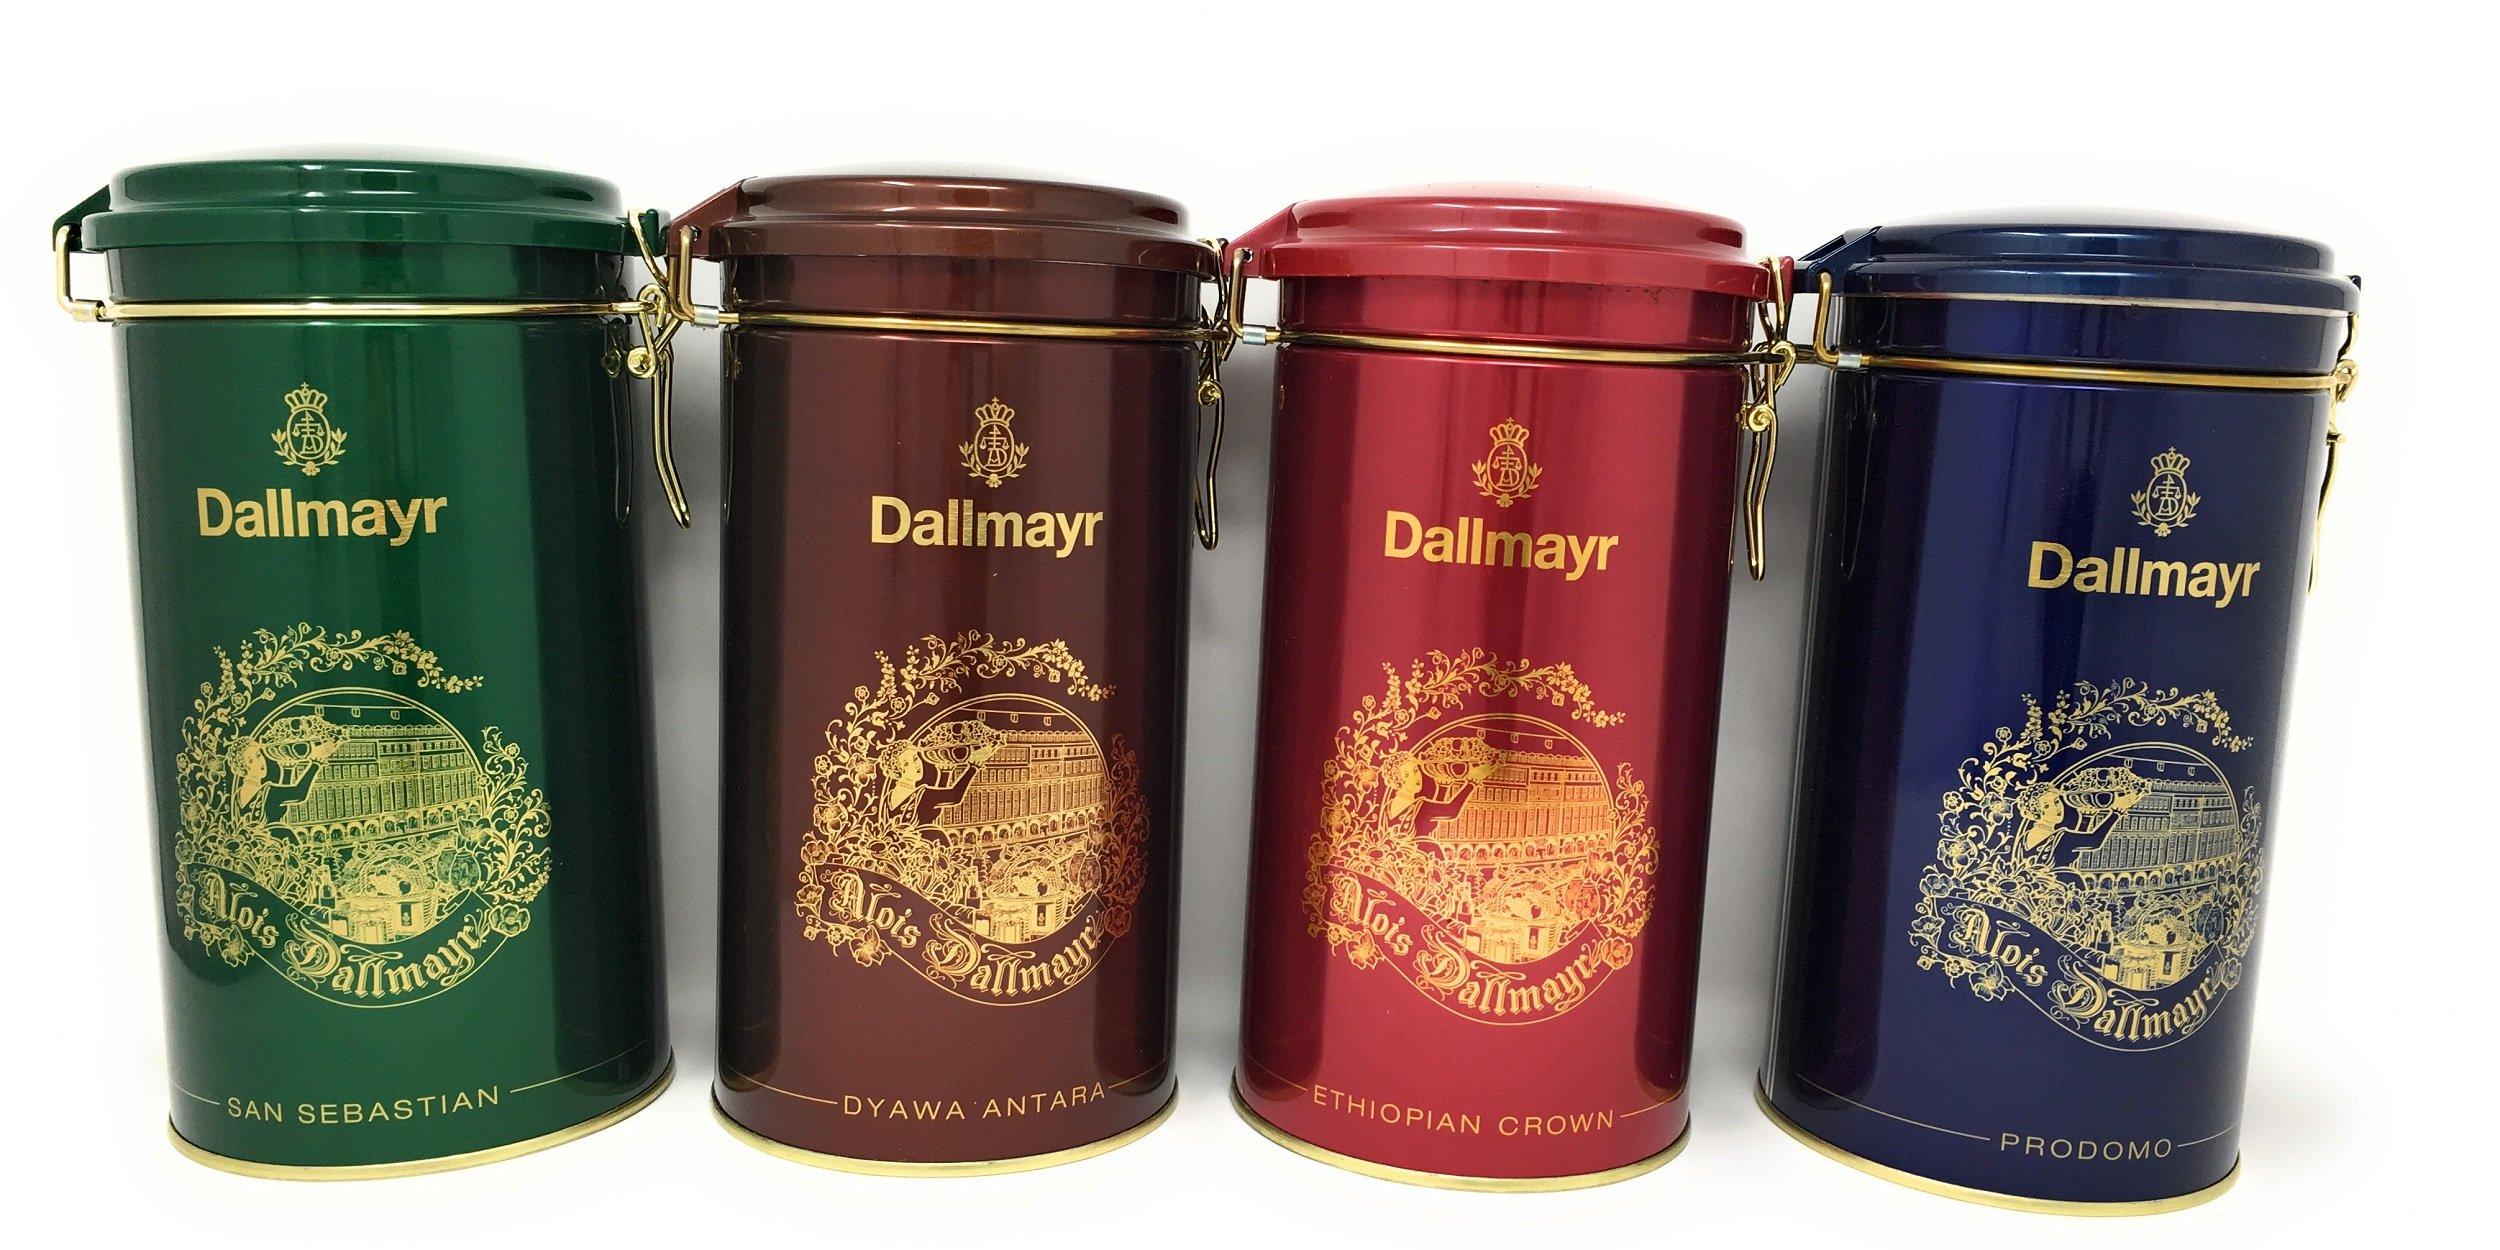 Dallymayr Holiday Gift Coffee Bundle in Festive 17.6 Ounce Gift Tins: One Each of Blue Prodomo, Green San Sebastian, Red Ethiopian Crown, and Bronze Dyawa Antara by Dallmayr